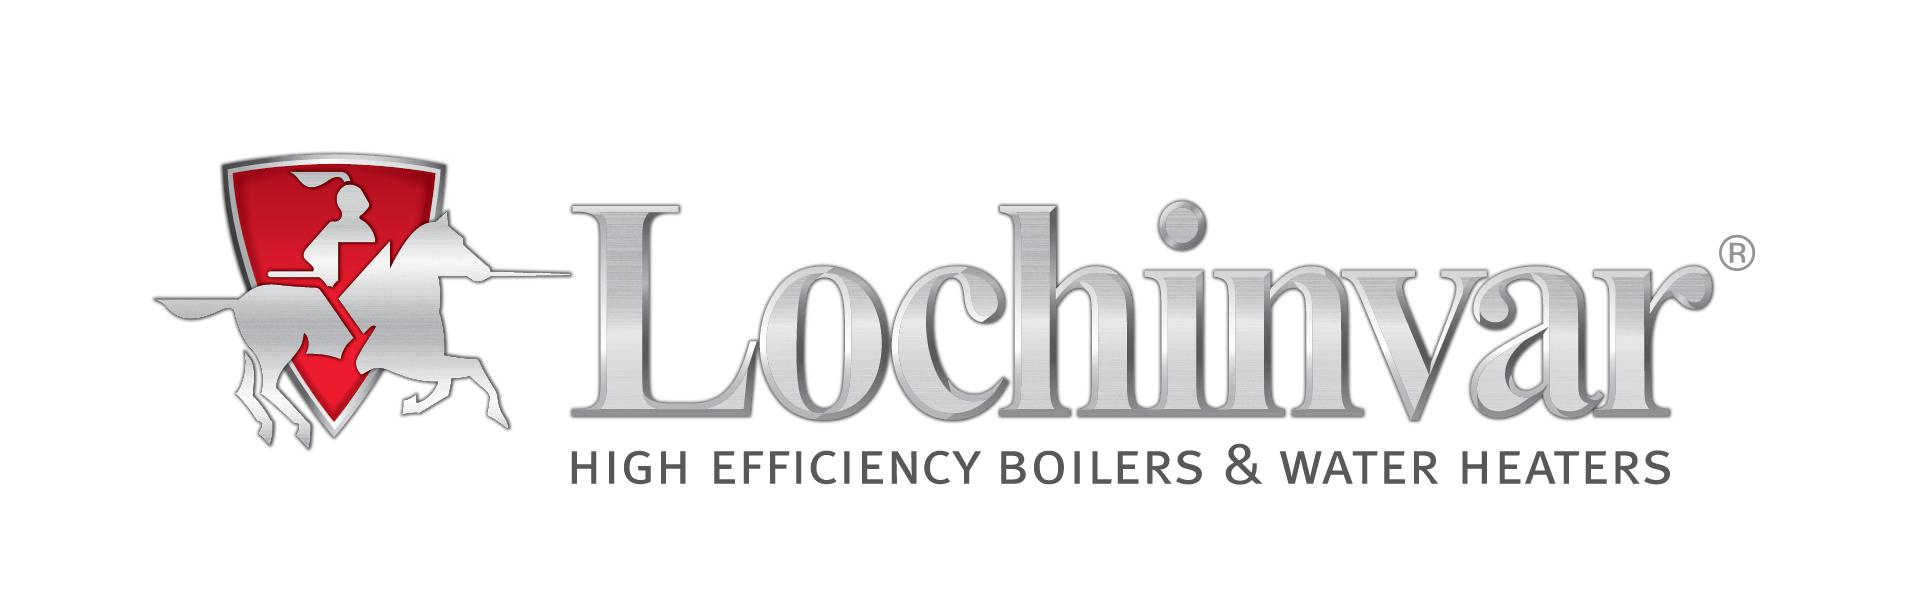 Lochinvar company logo